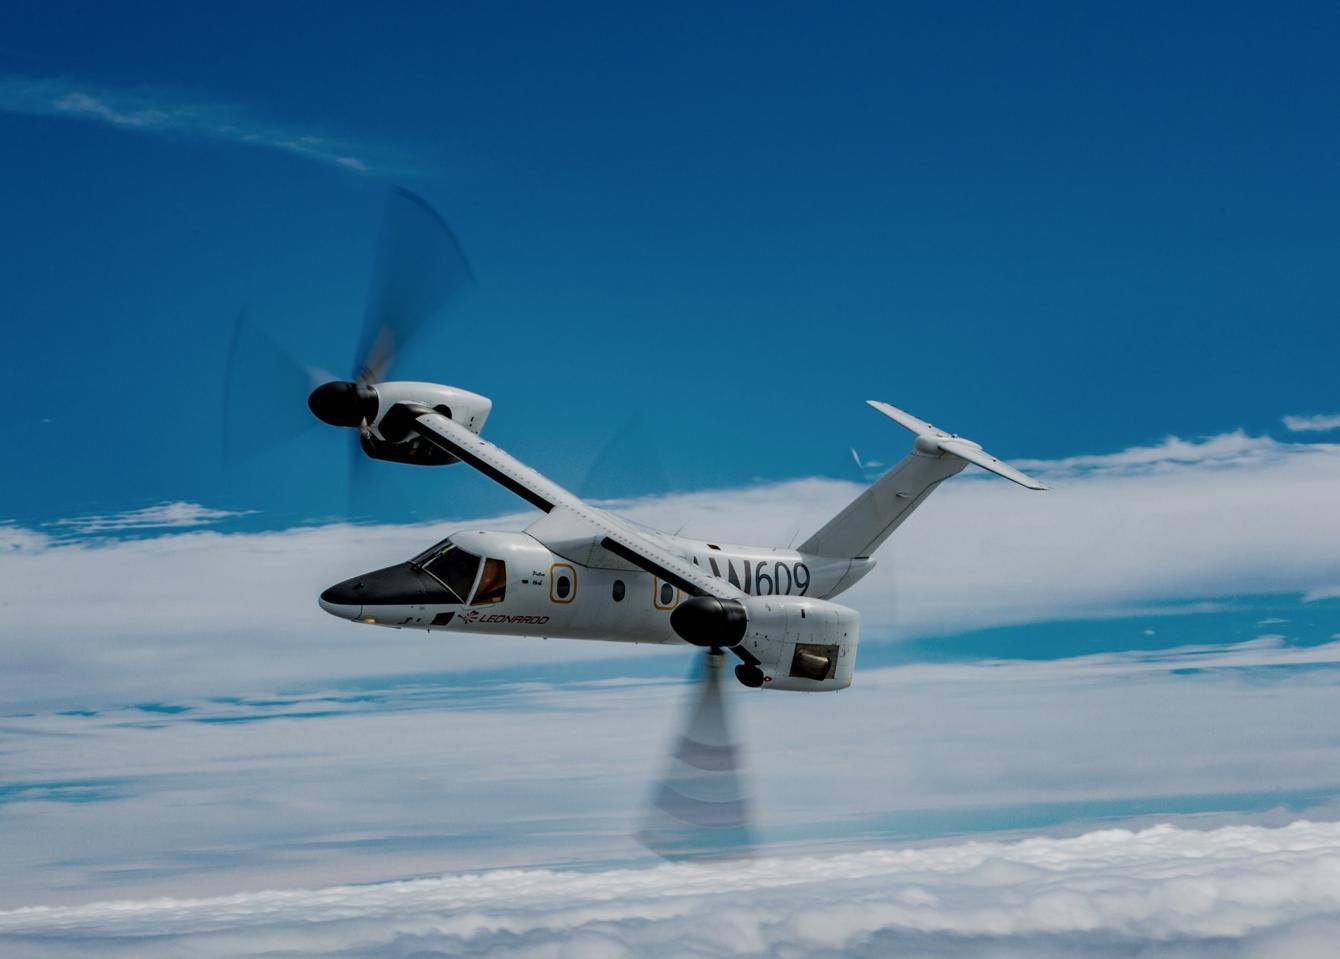 AW609 - Leonardo - Aerospace, Defence and Security